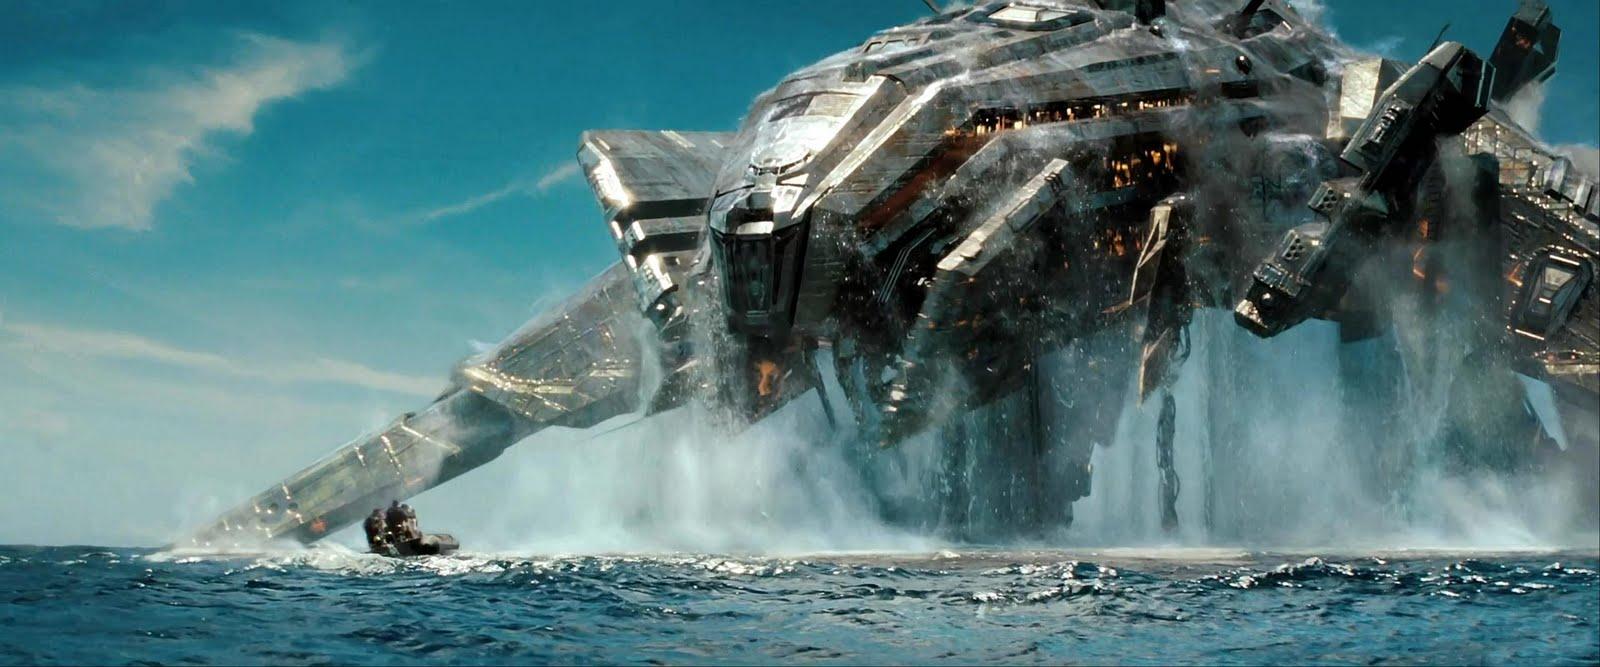 battleship 2012 movie hd - photo #17